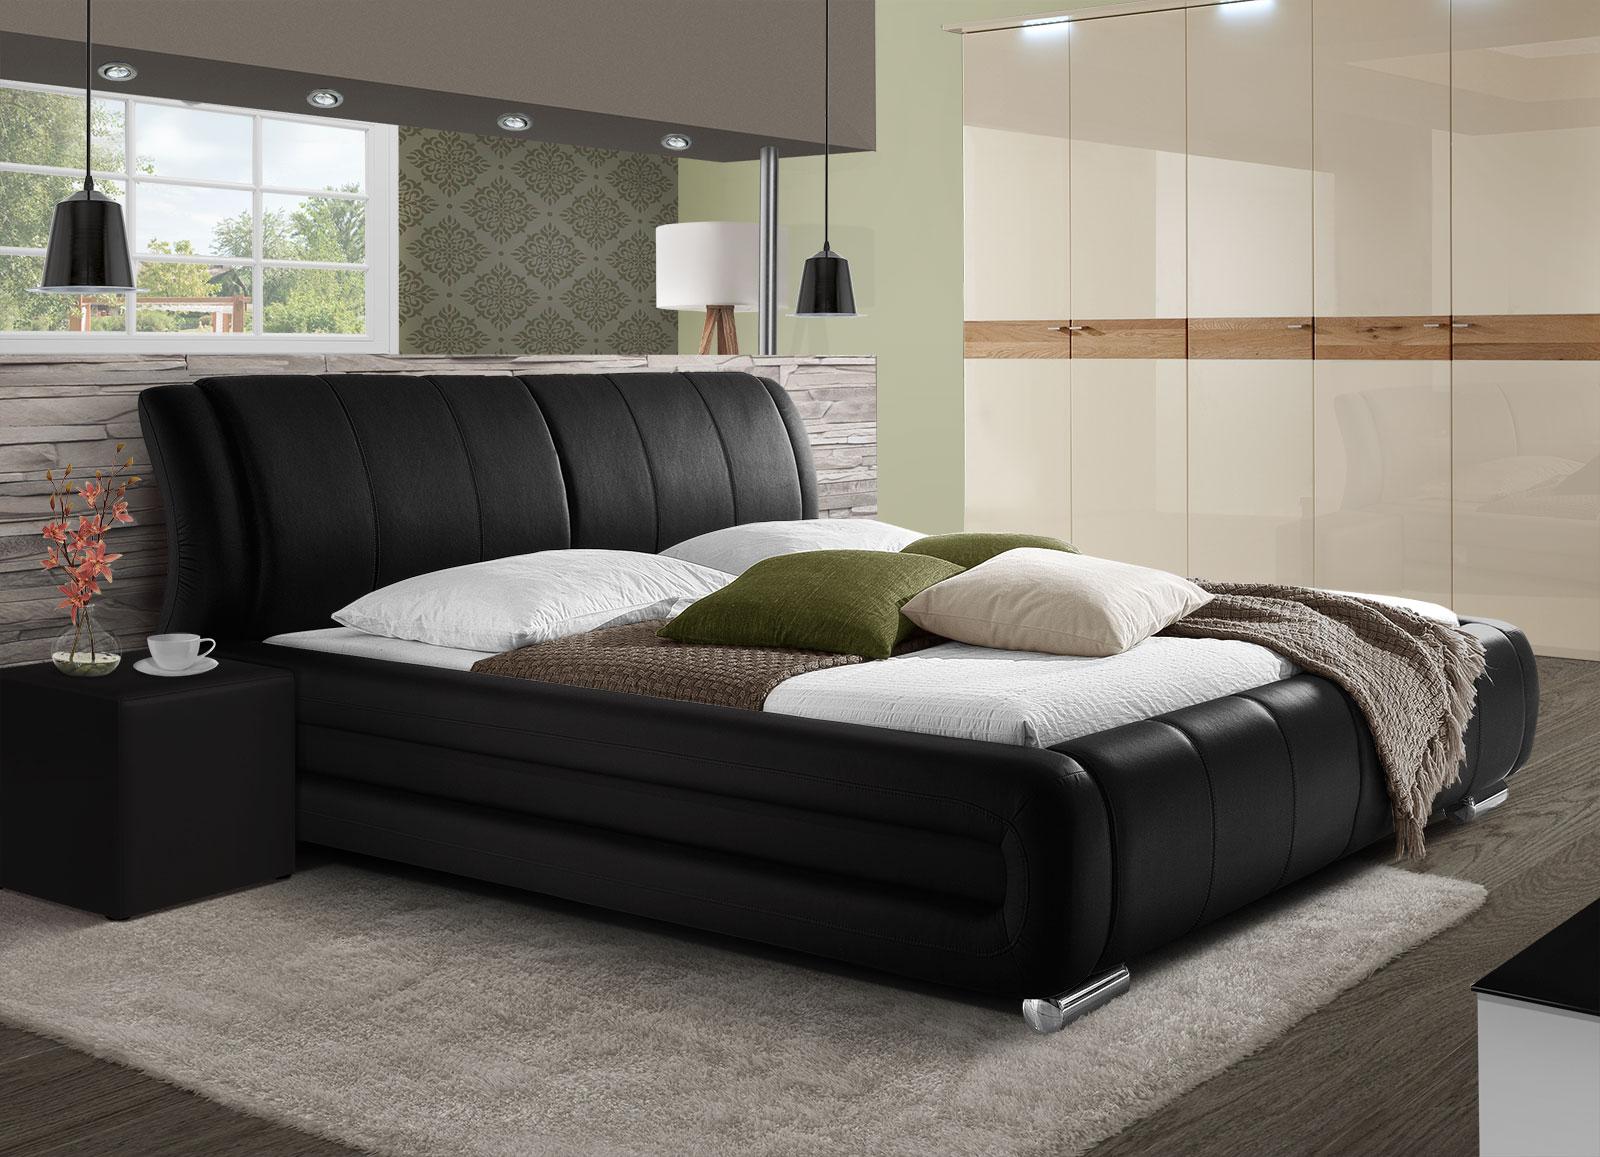 kunstlederbett in braun schwarz oder wei petersfield. Black Bedroom Furniture Sets. Home Design Ideas